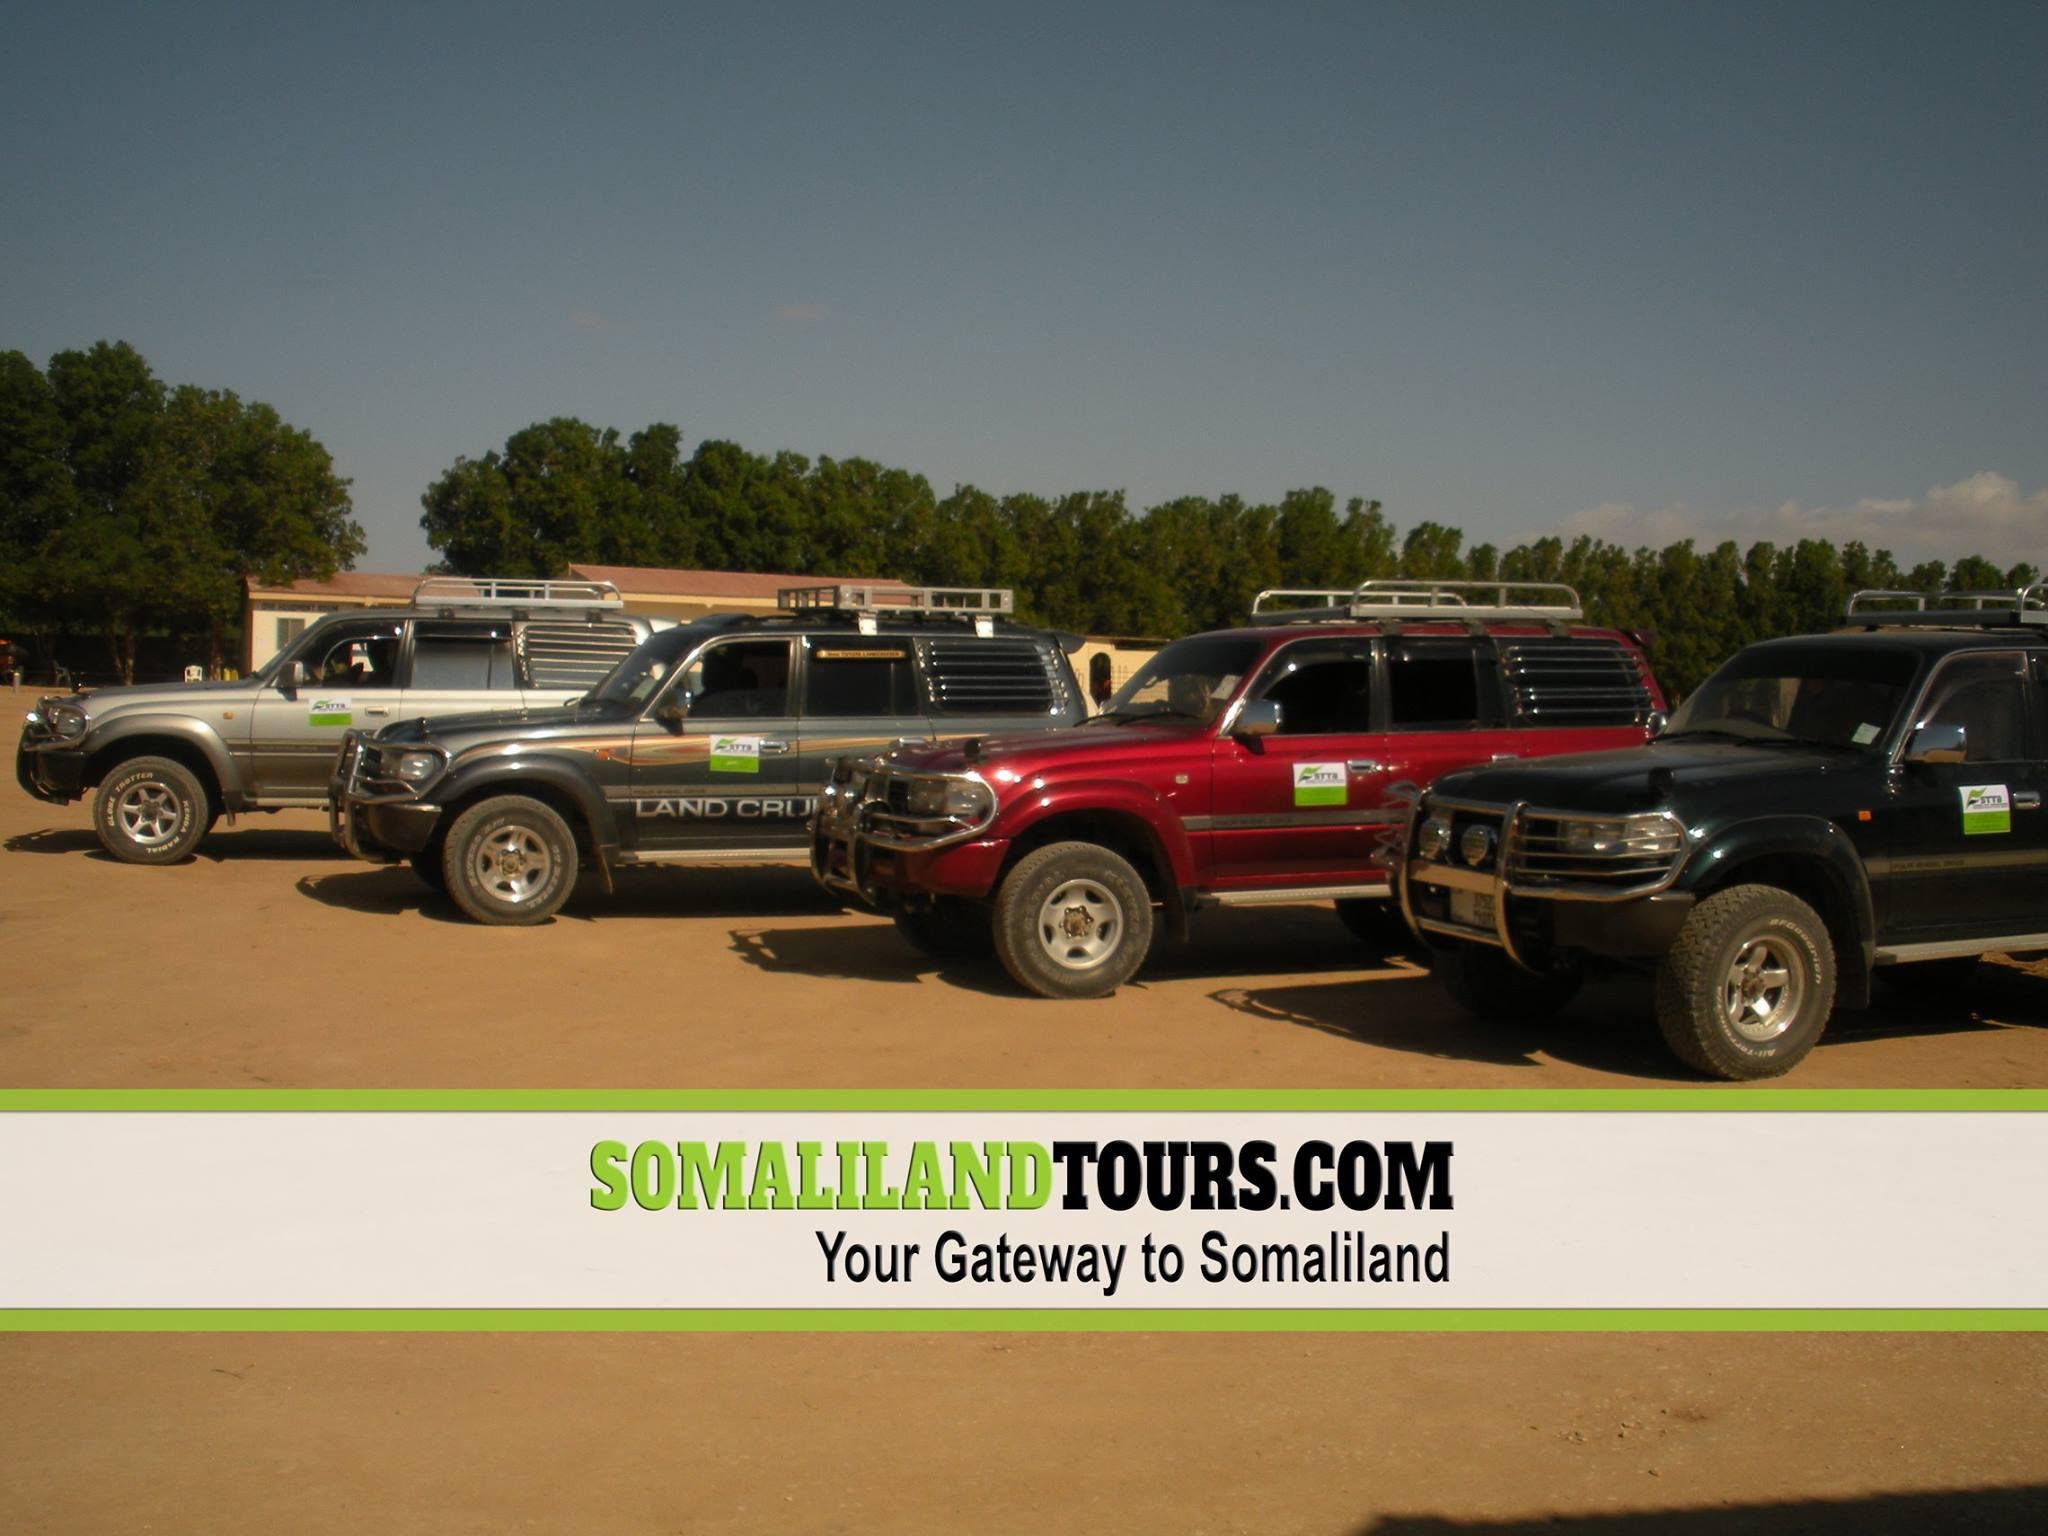 somaliland tour transport